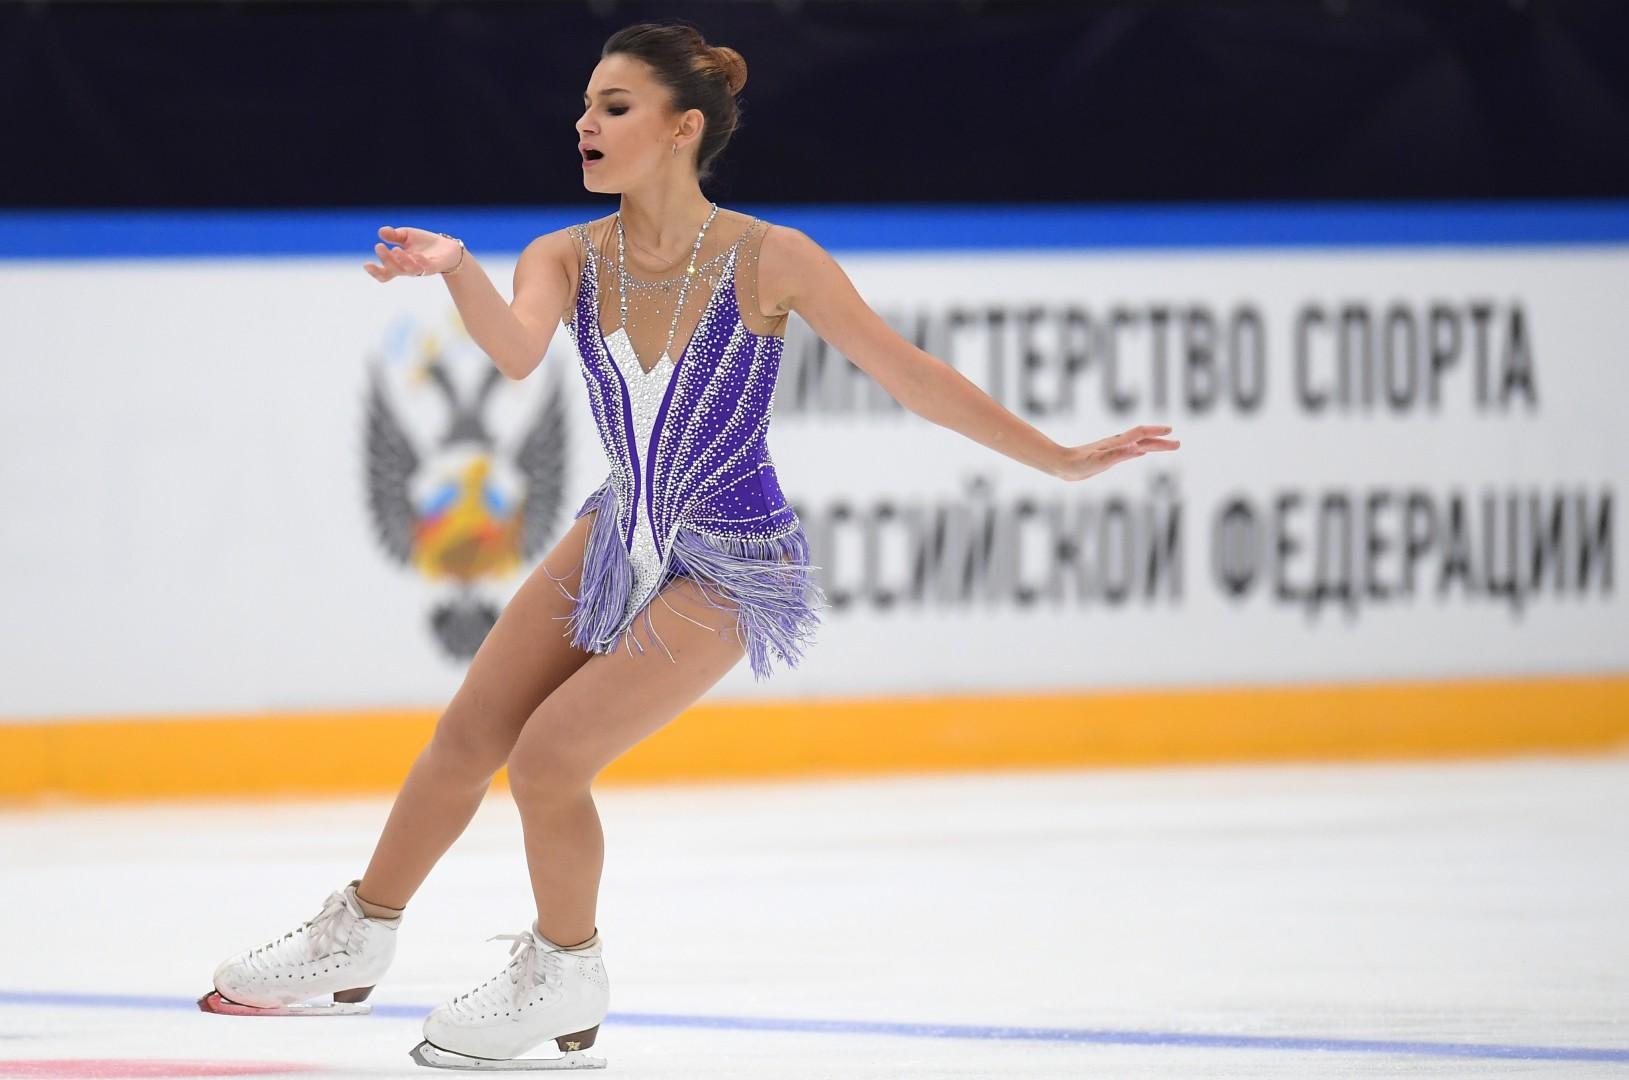 Софья Самодурова - Страница 4 2f4Nd9Bx5yU